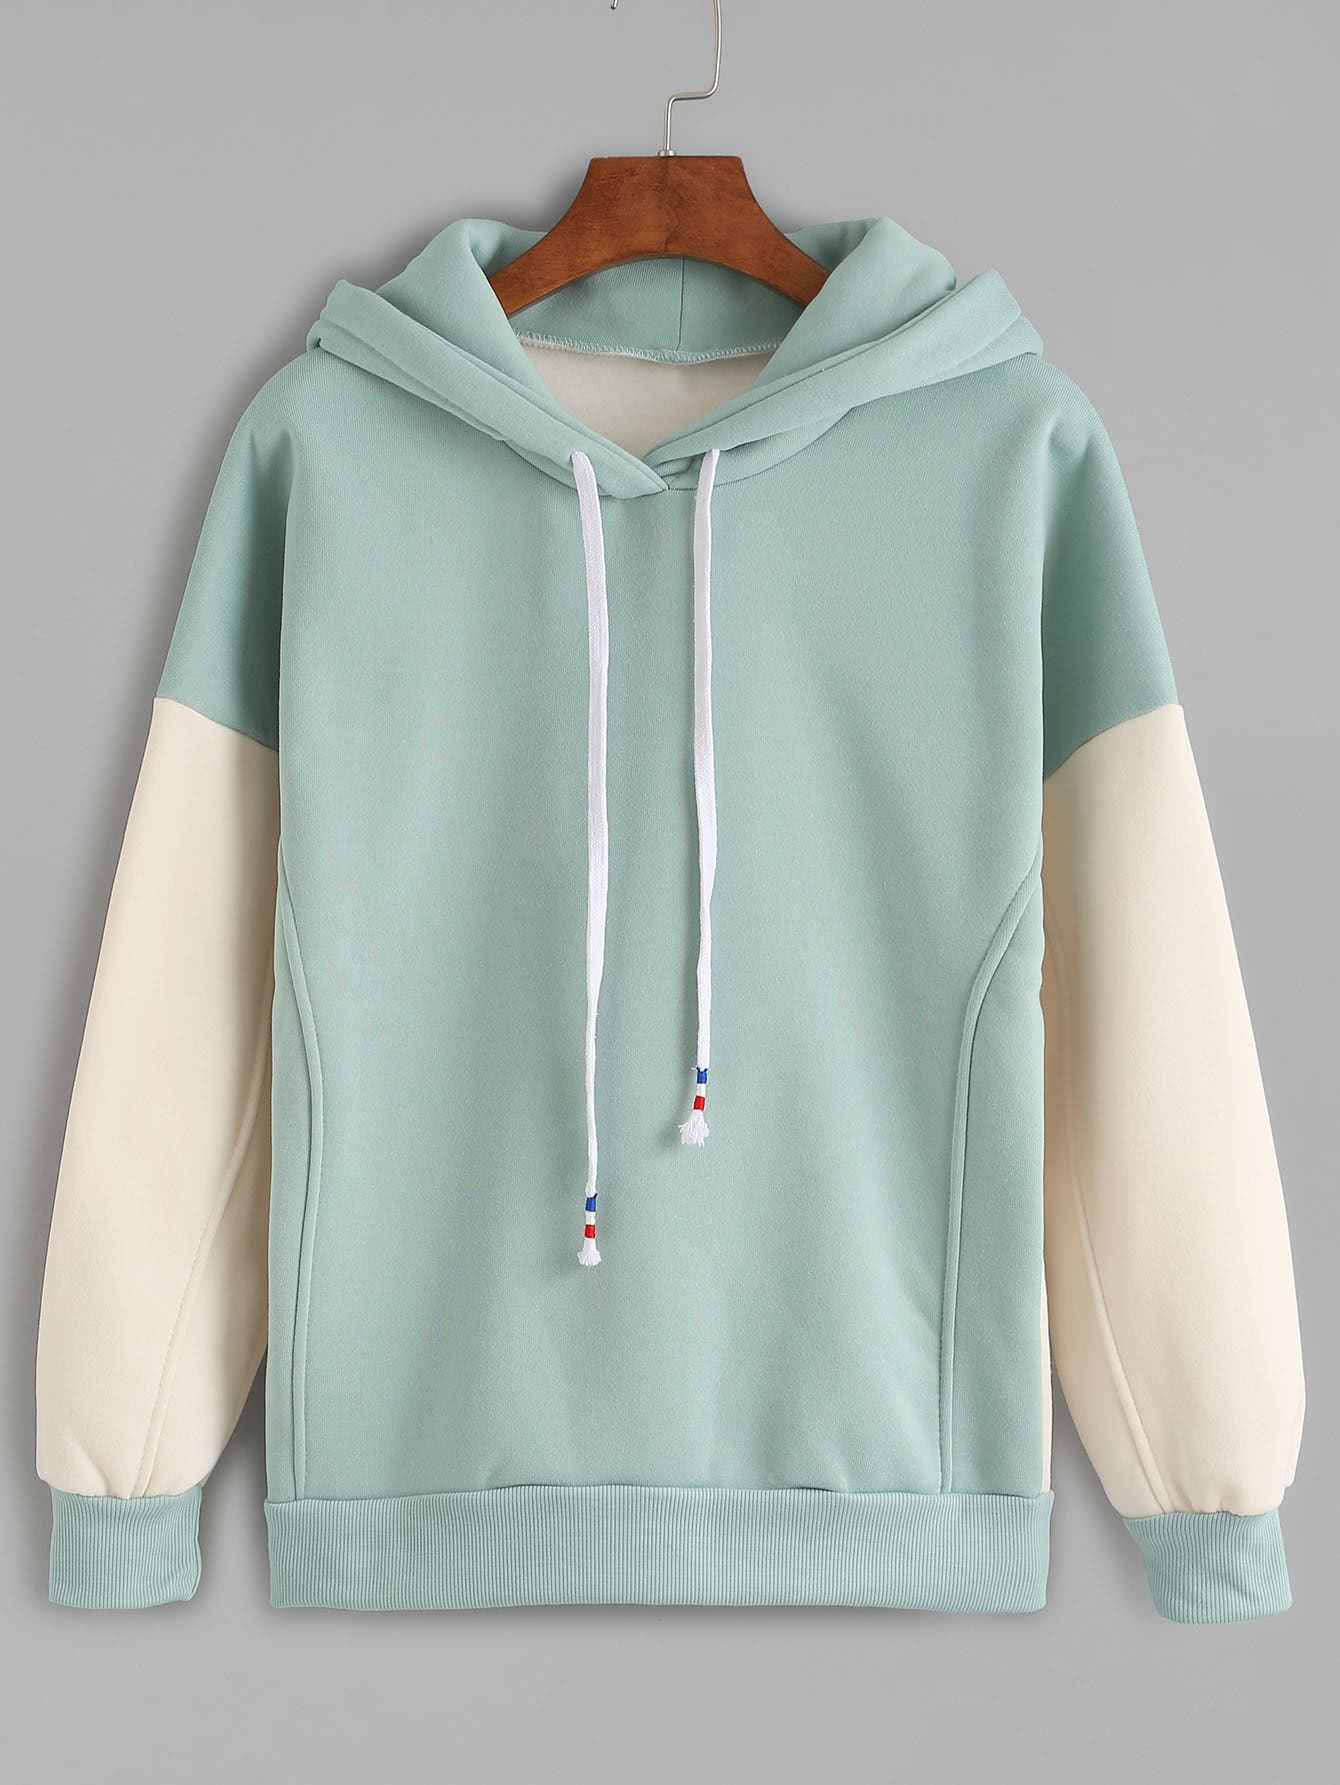 Contrast Sleeve Drawstring Hooded Sweatshirt